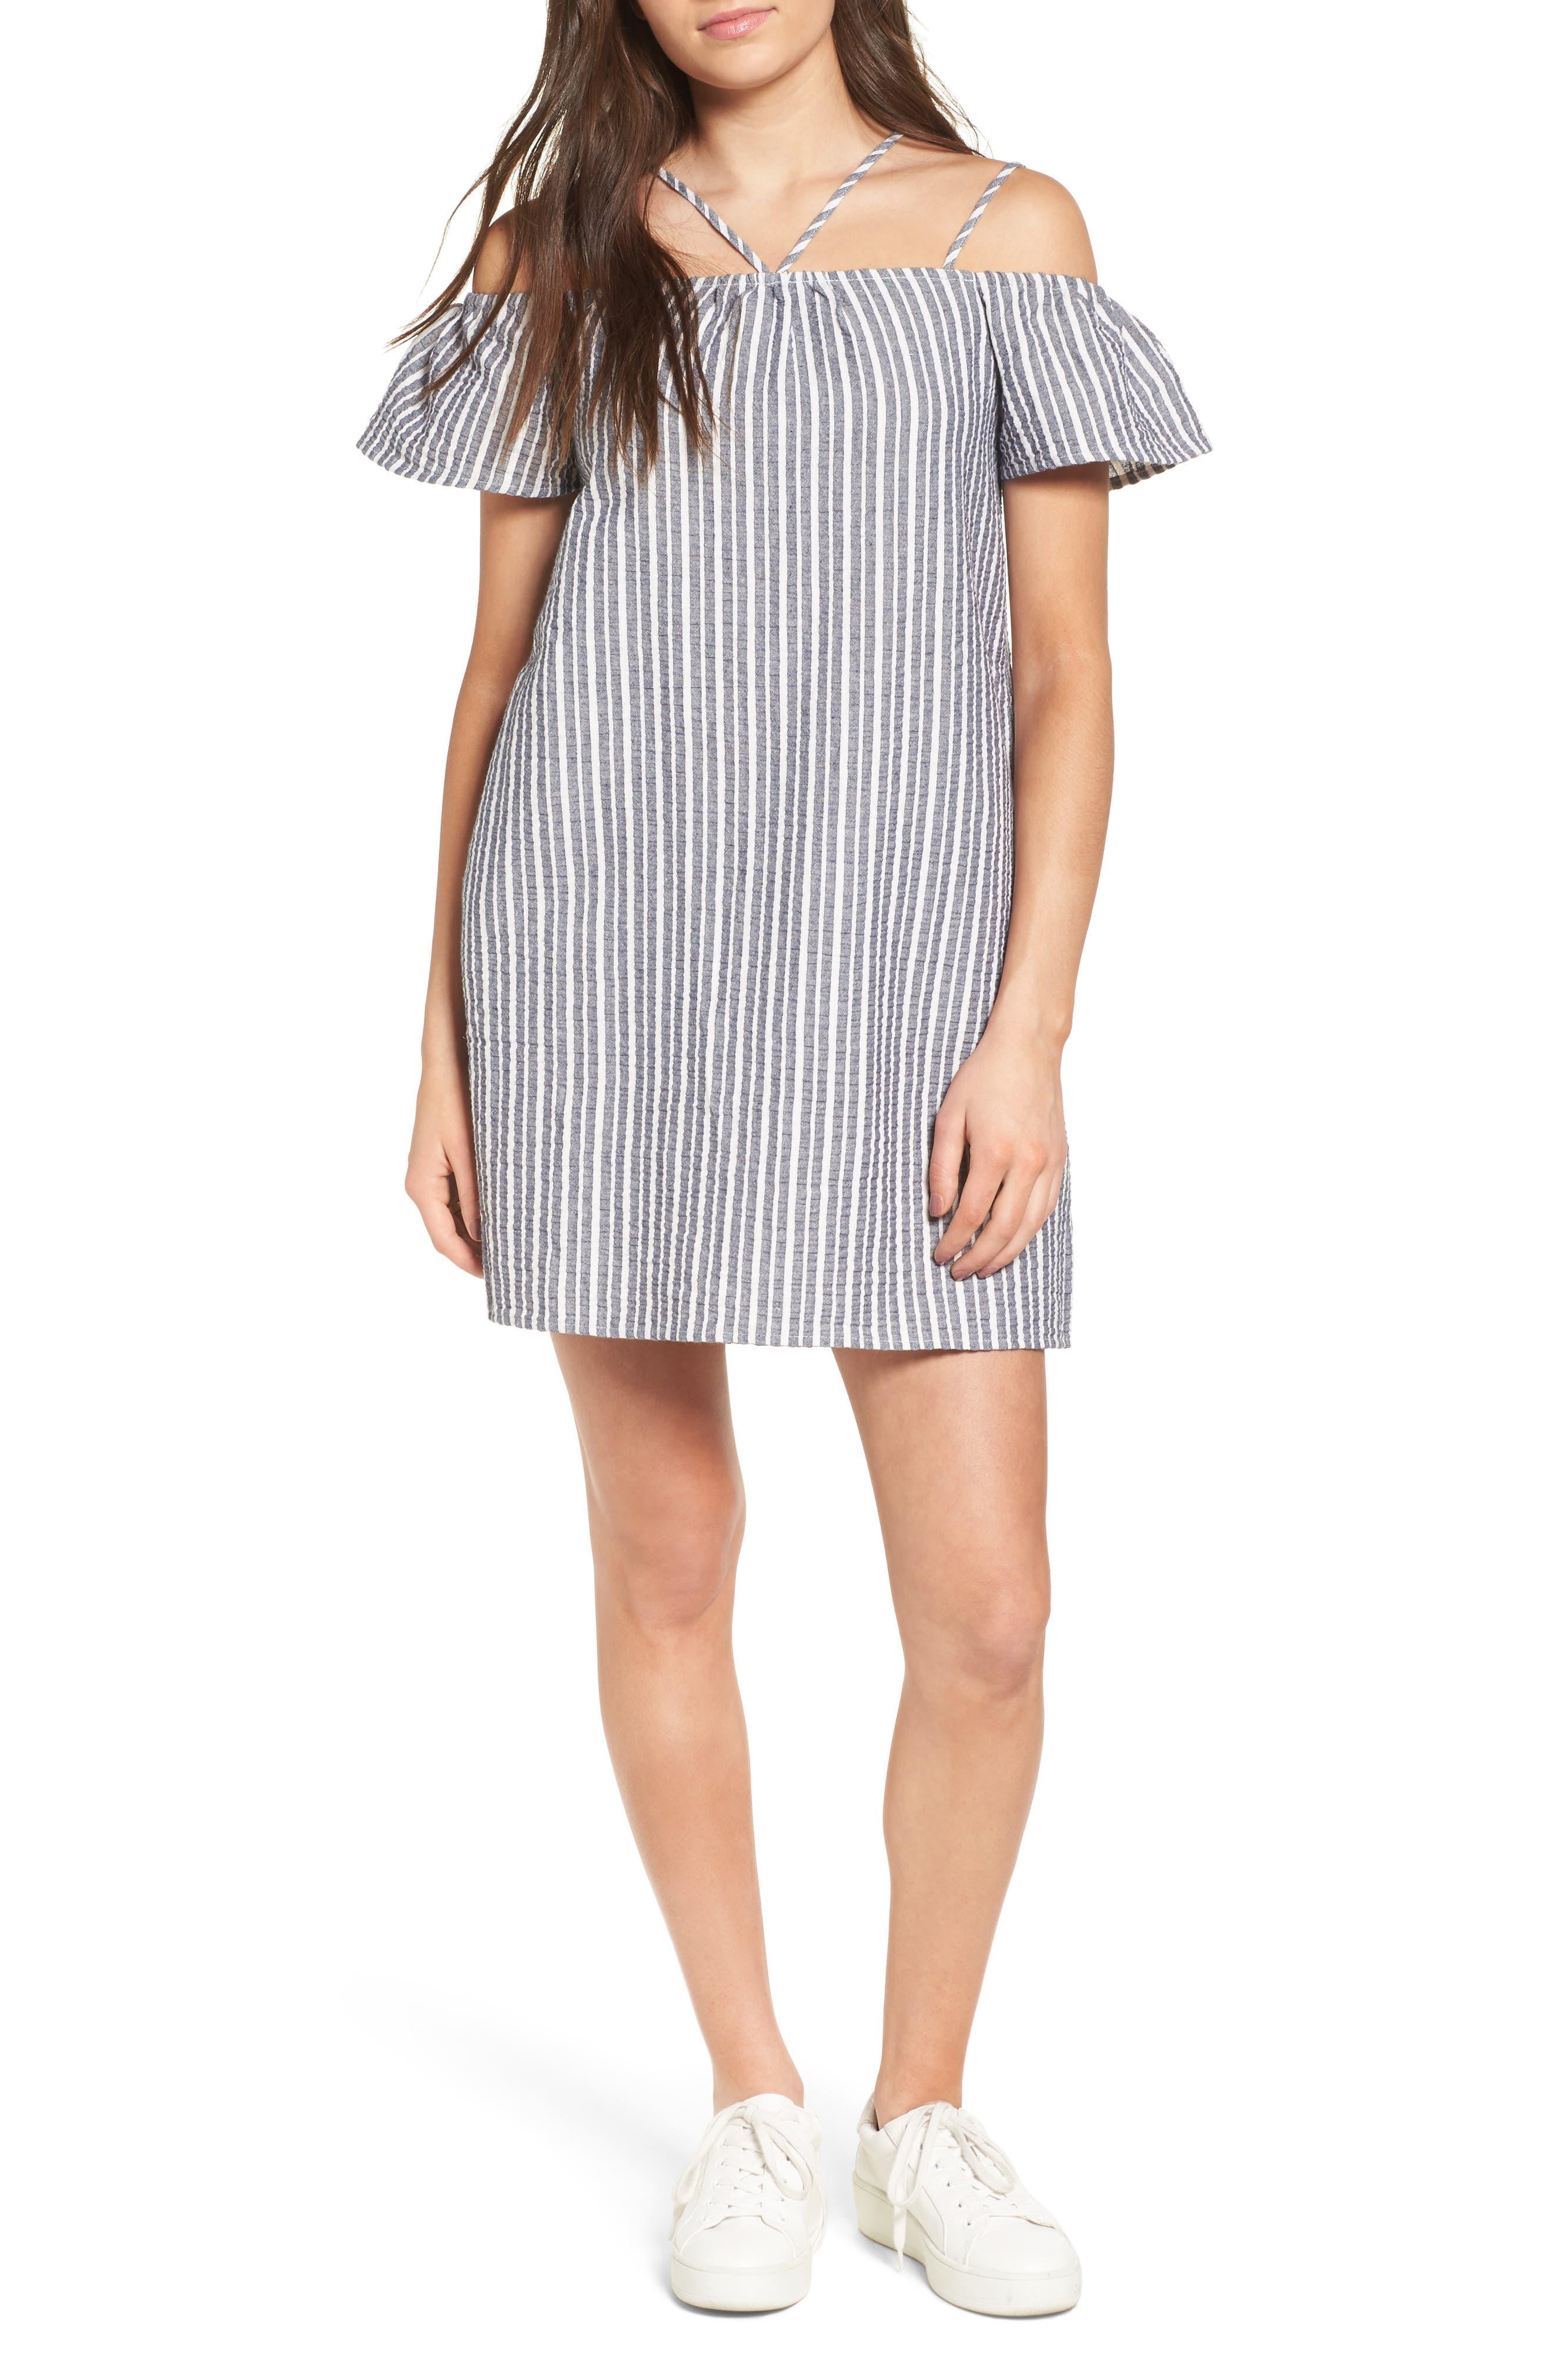 Alternate Image 1 Selected - Lush Stripe Off the Shoulder Dress